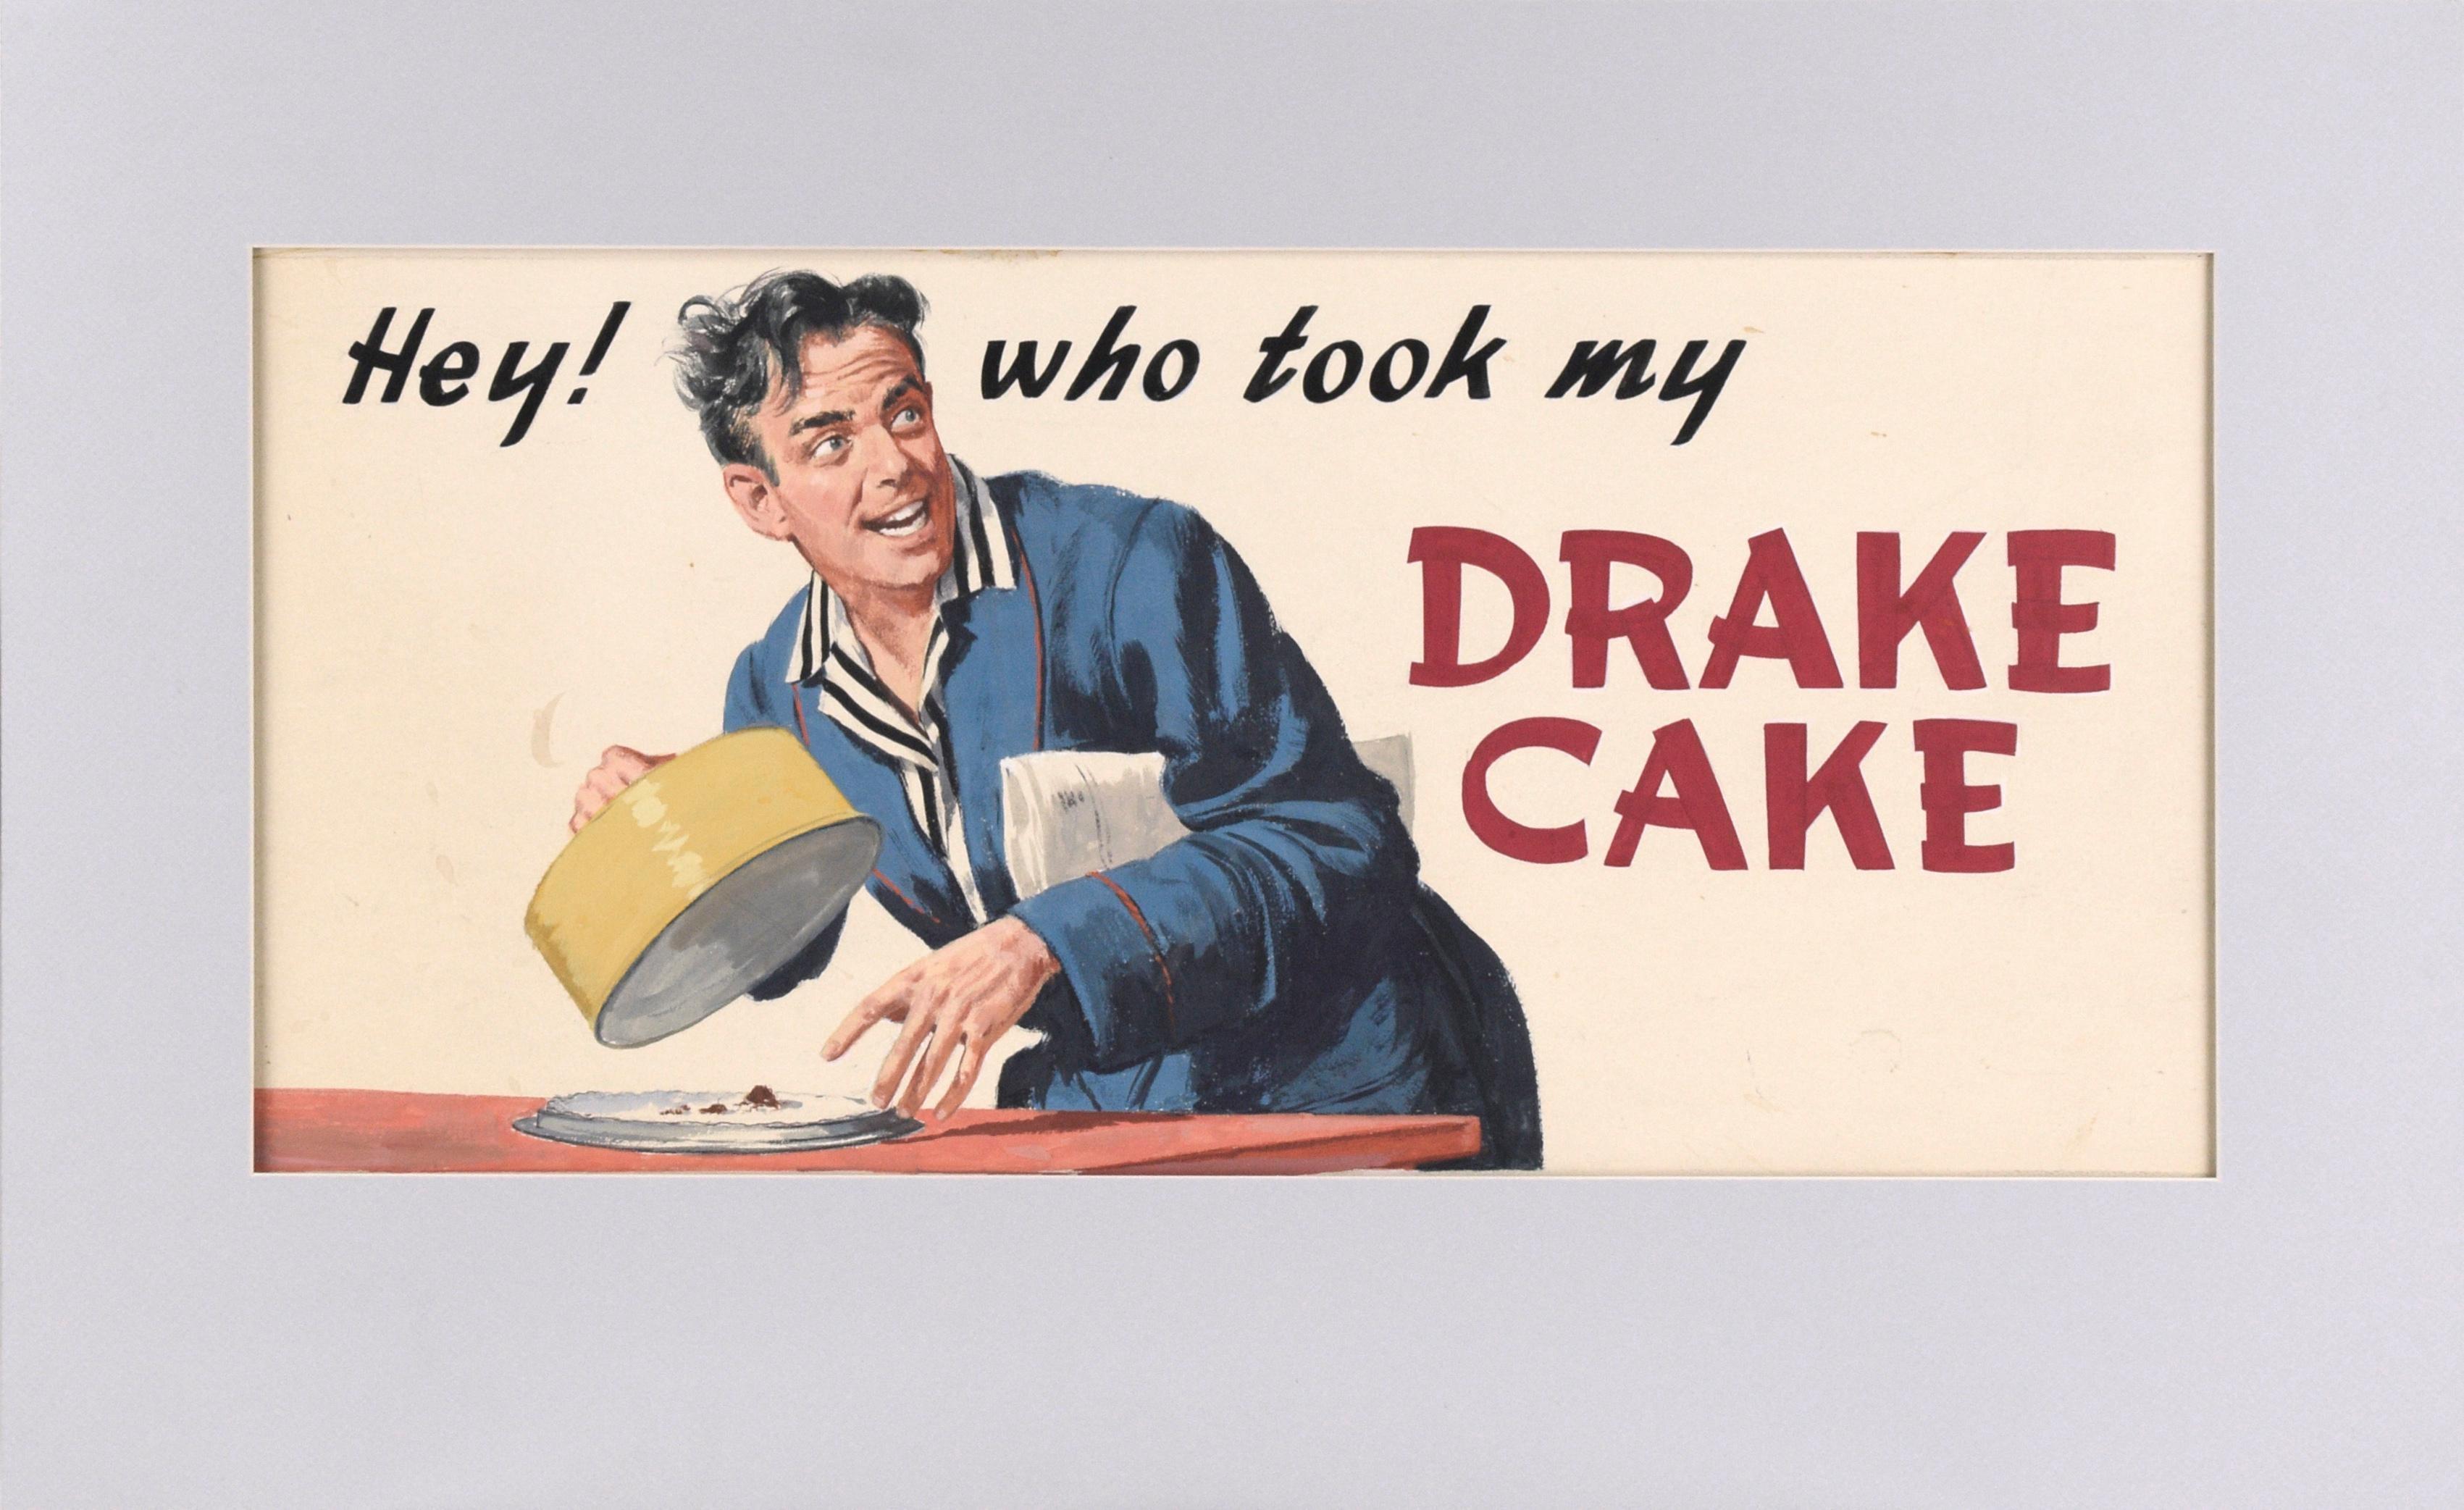 """Hey! who took my Drake Cake"" - Vintage Advertisement - Original Illustration"